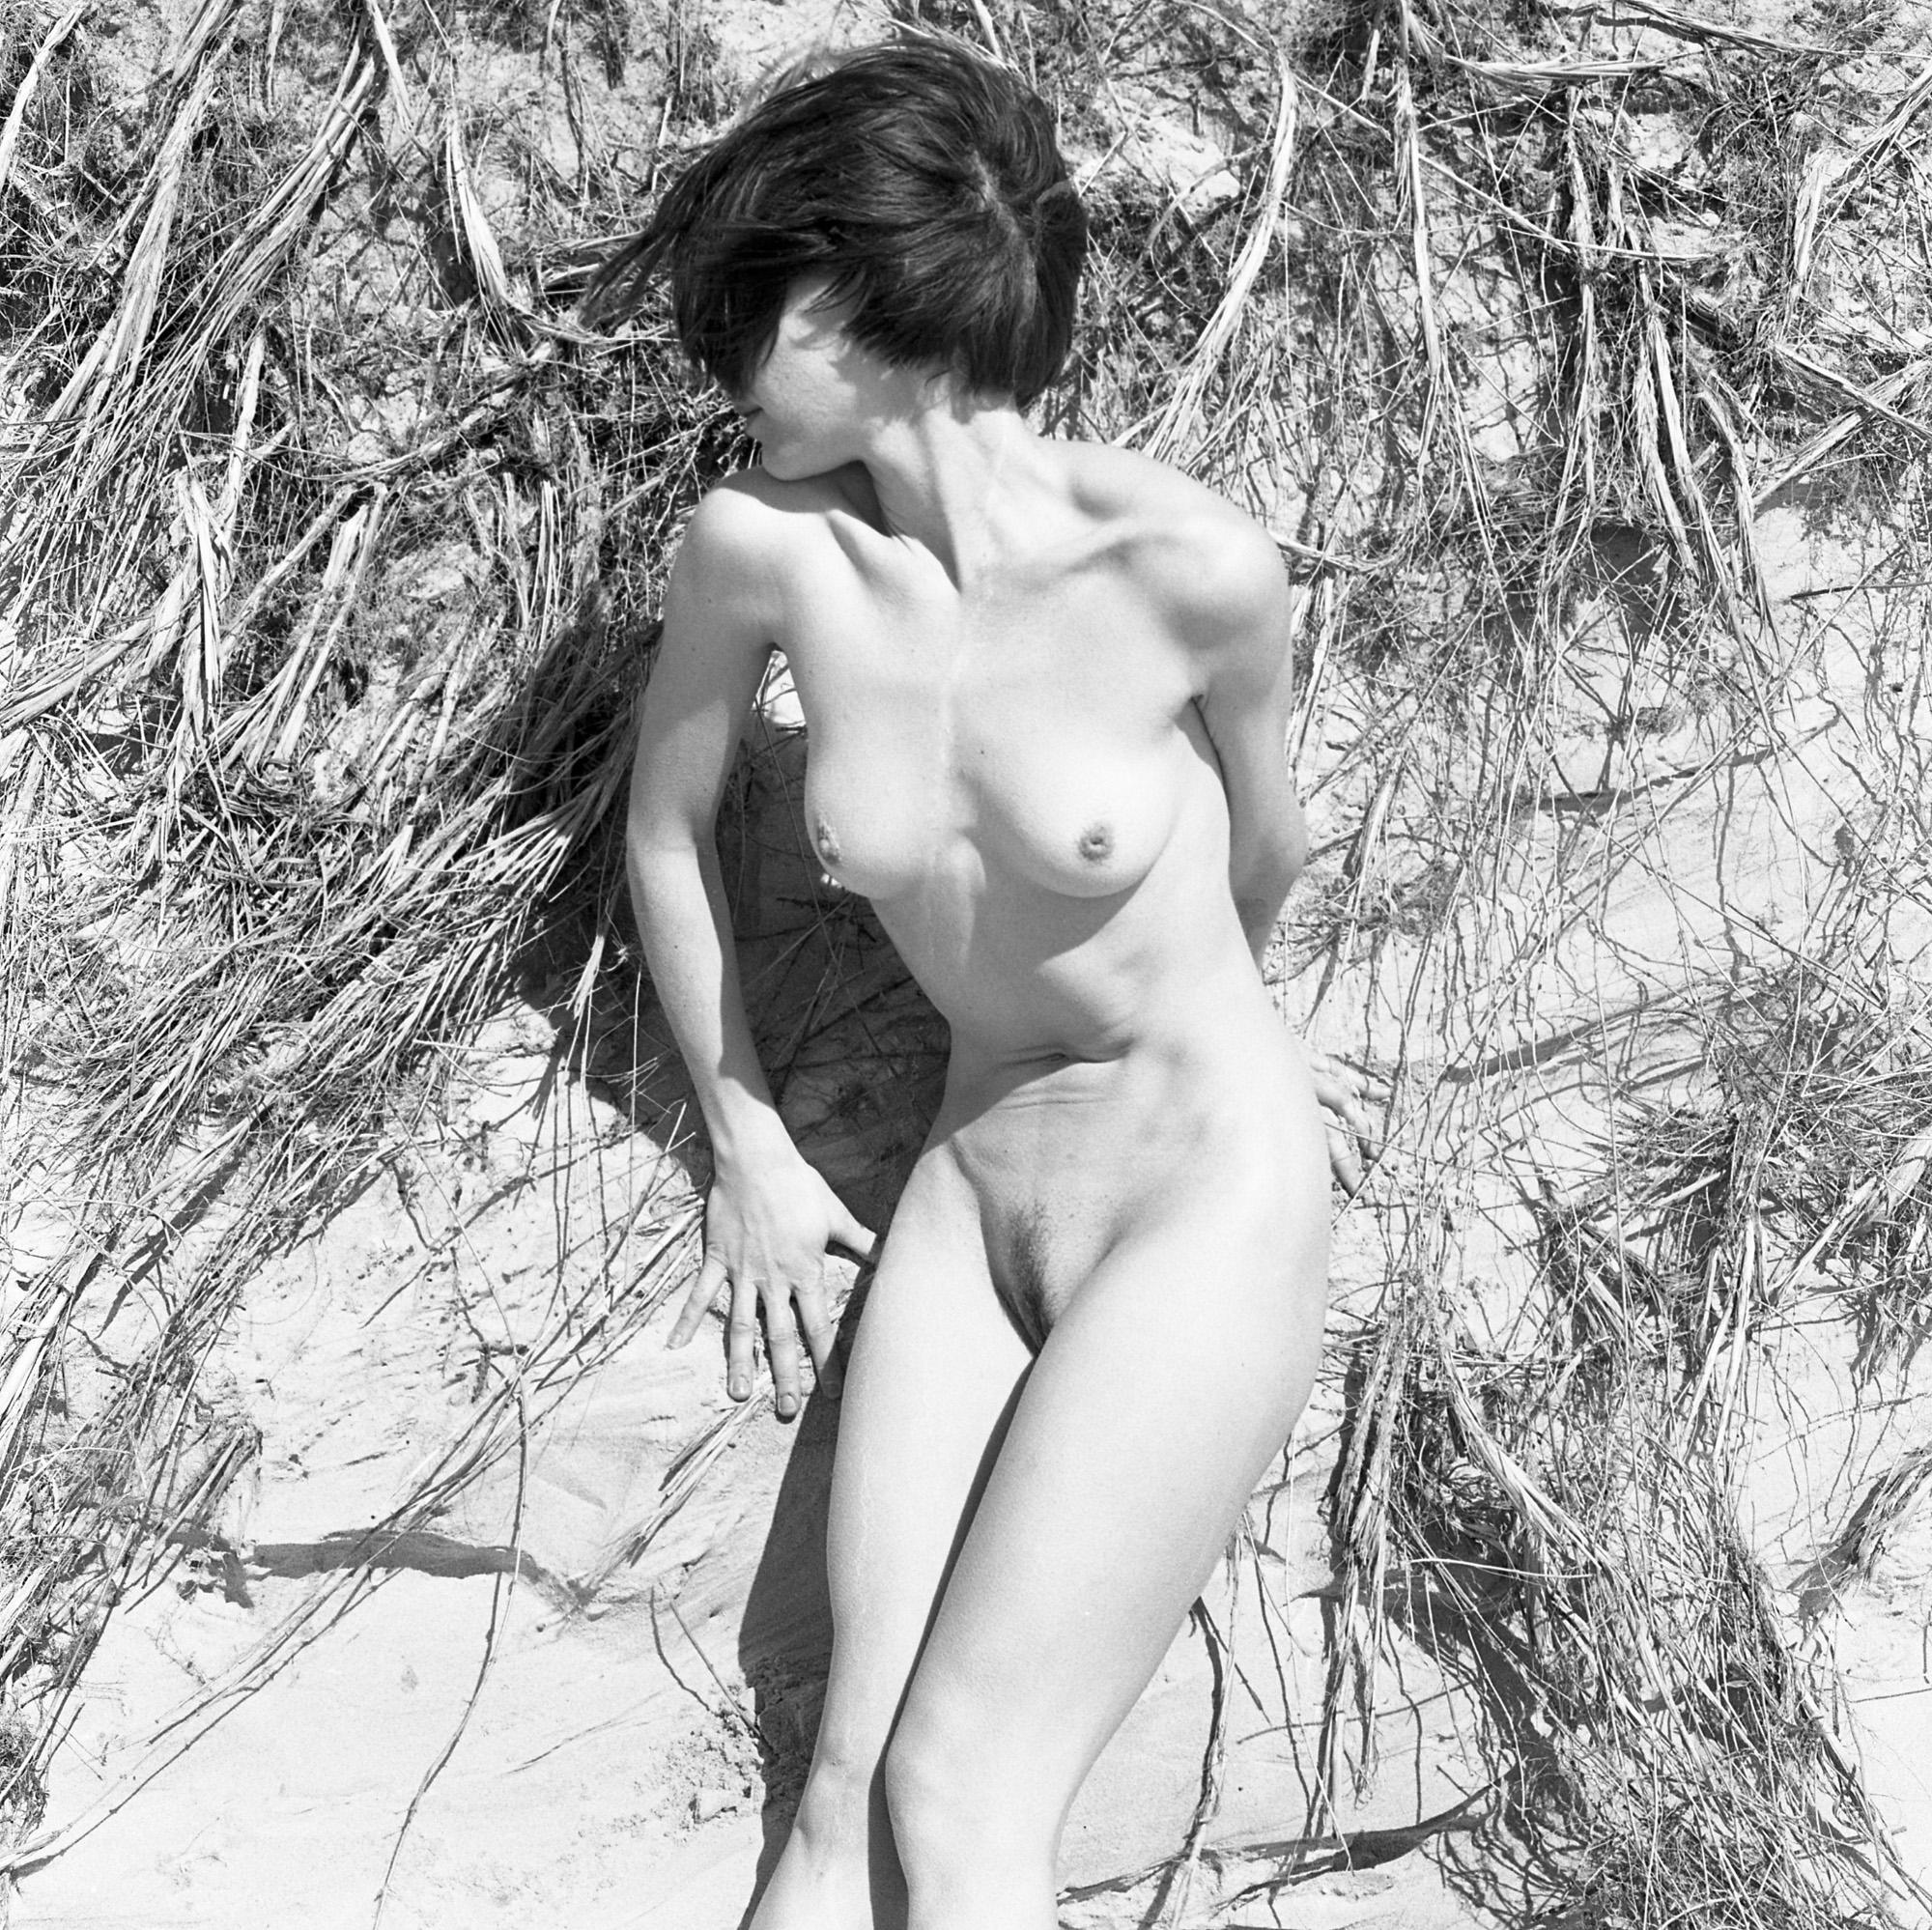 Henrikson Archive Nudes web_26.jpg